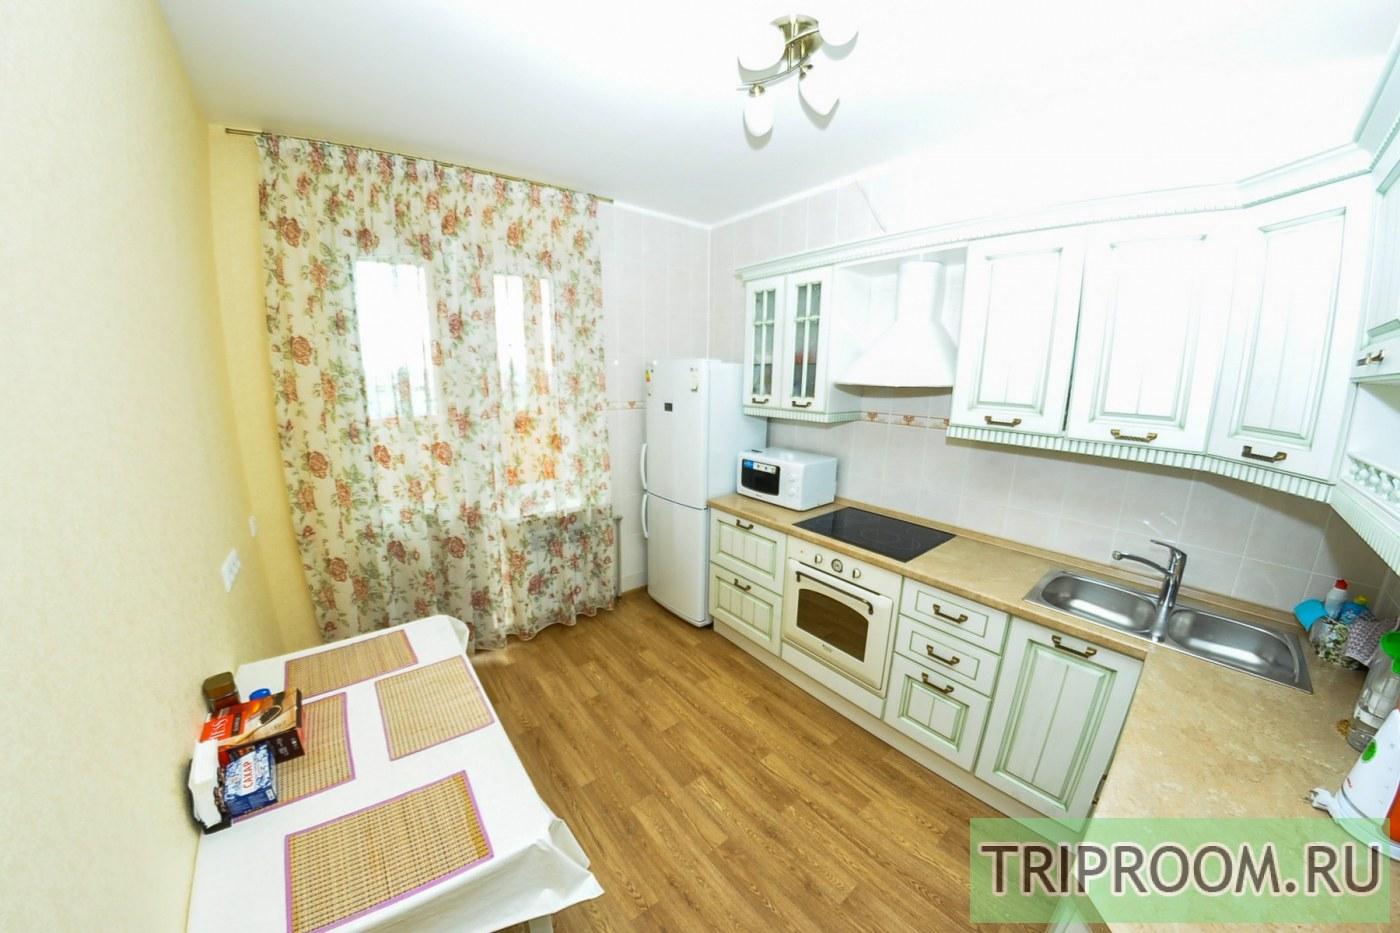 1-комнатная квартира посуточно (вариант № 39814), ул. Ленинский проспект, фото № 9